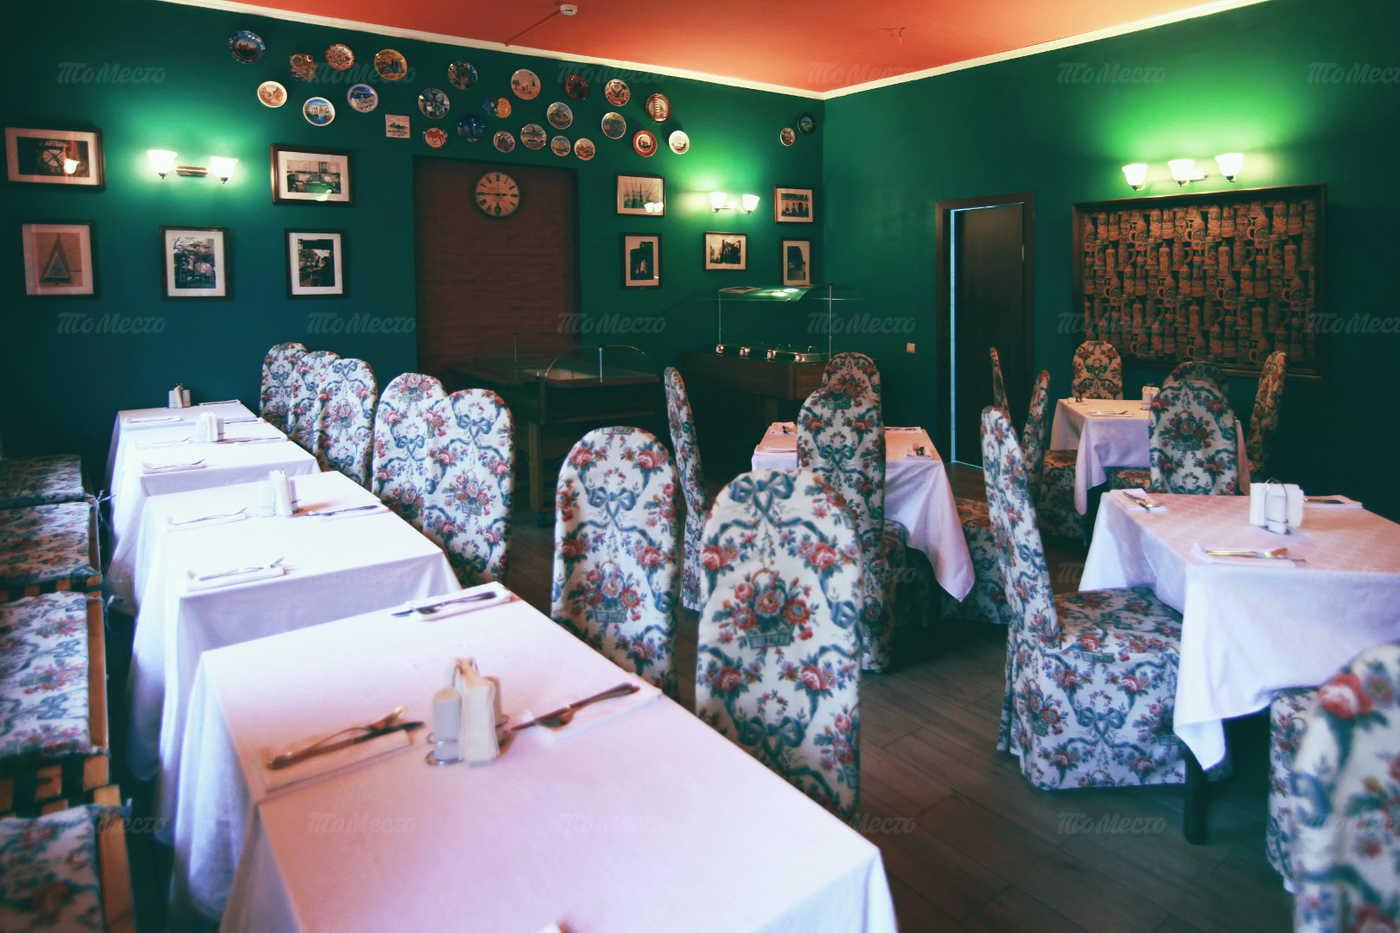 Меню ресторана Гранд Виктория на улице Щипок